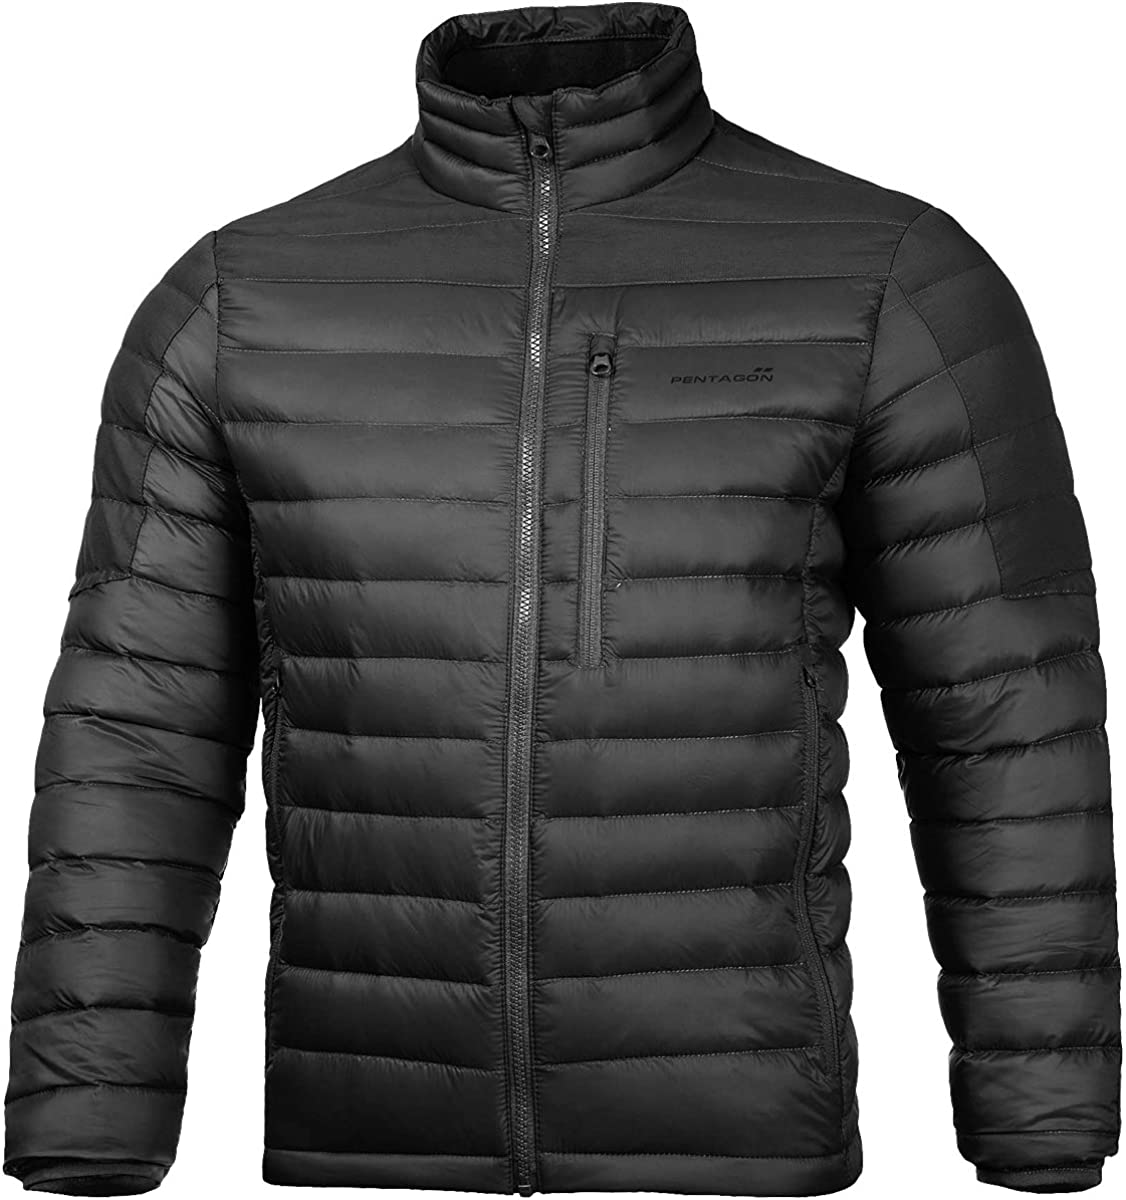 Pentagon Men's Geraki Jacket Super special price Black safety